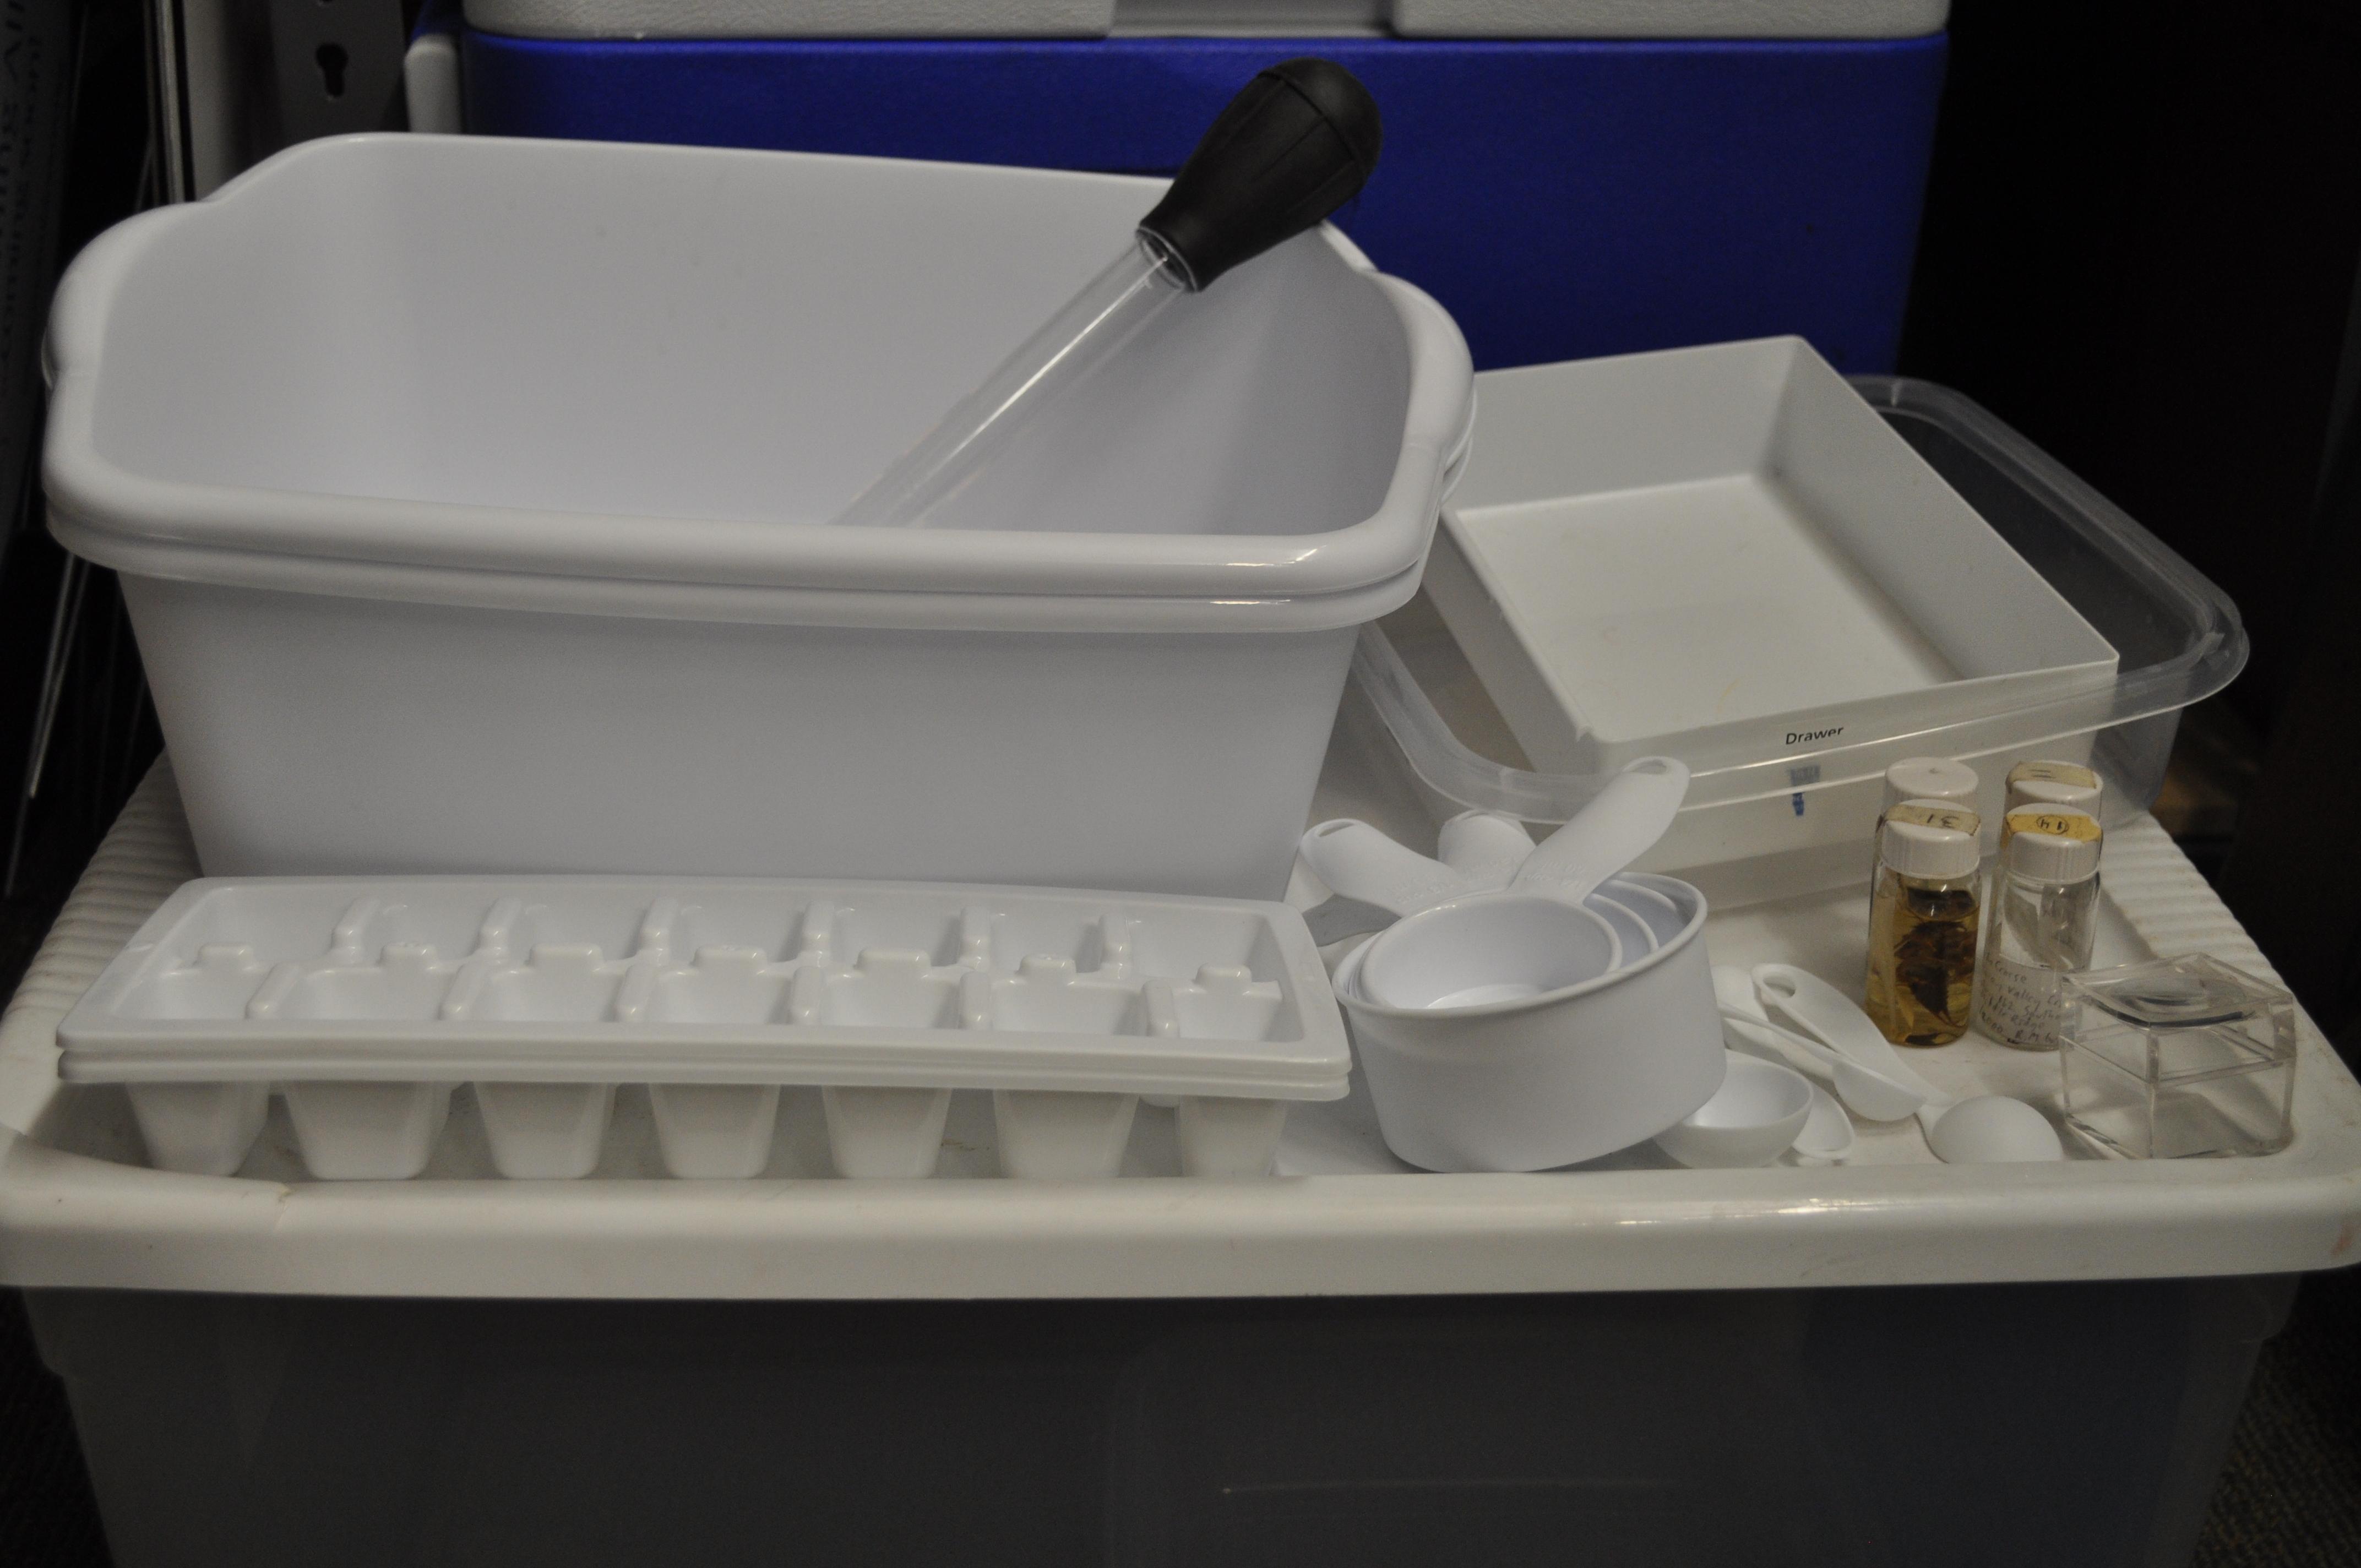 macroinvertebrate sampling kit